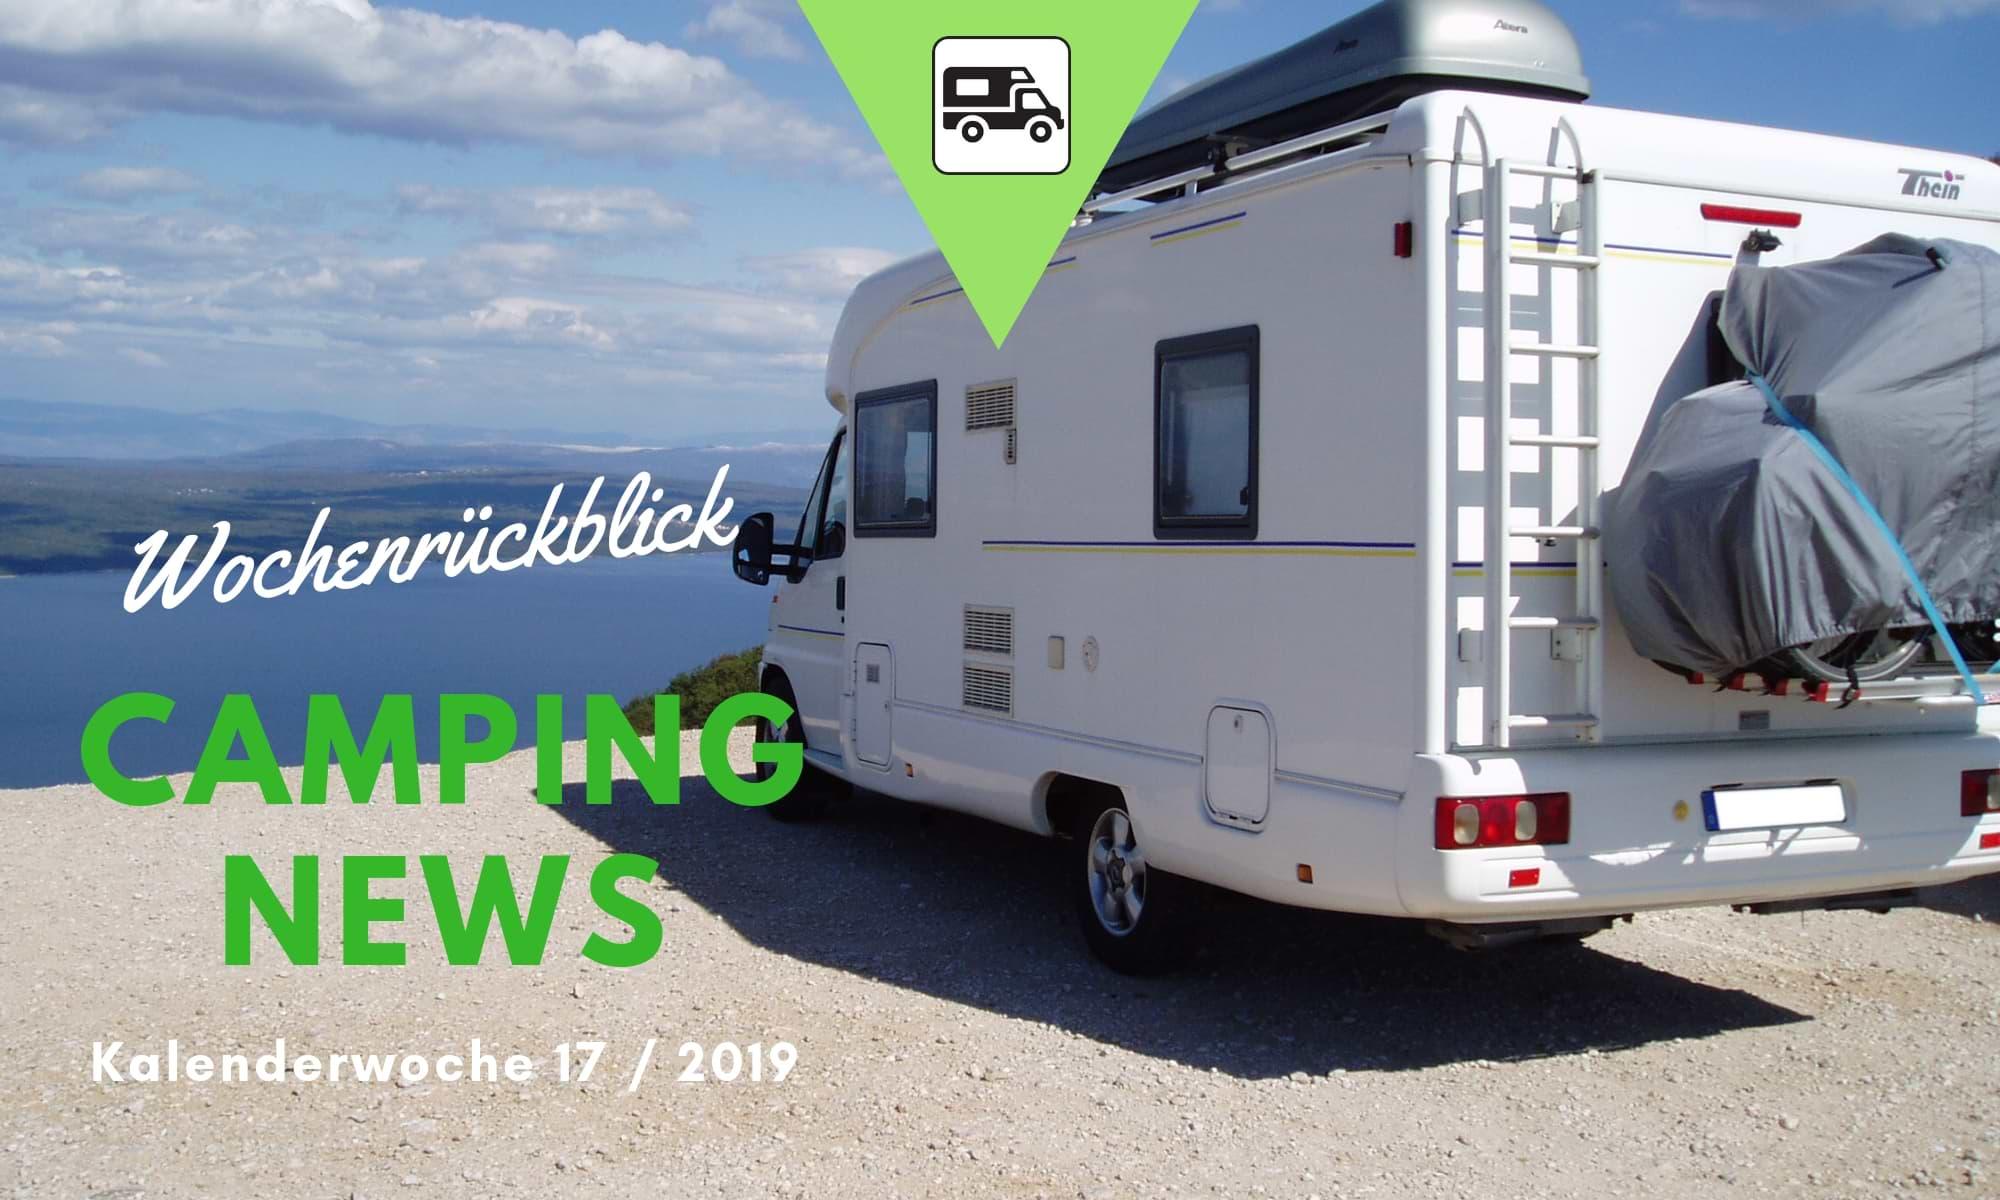 Wochenrückblick Camping News KW17-2019